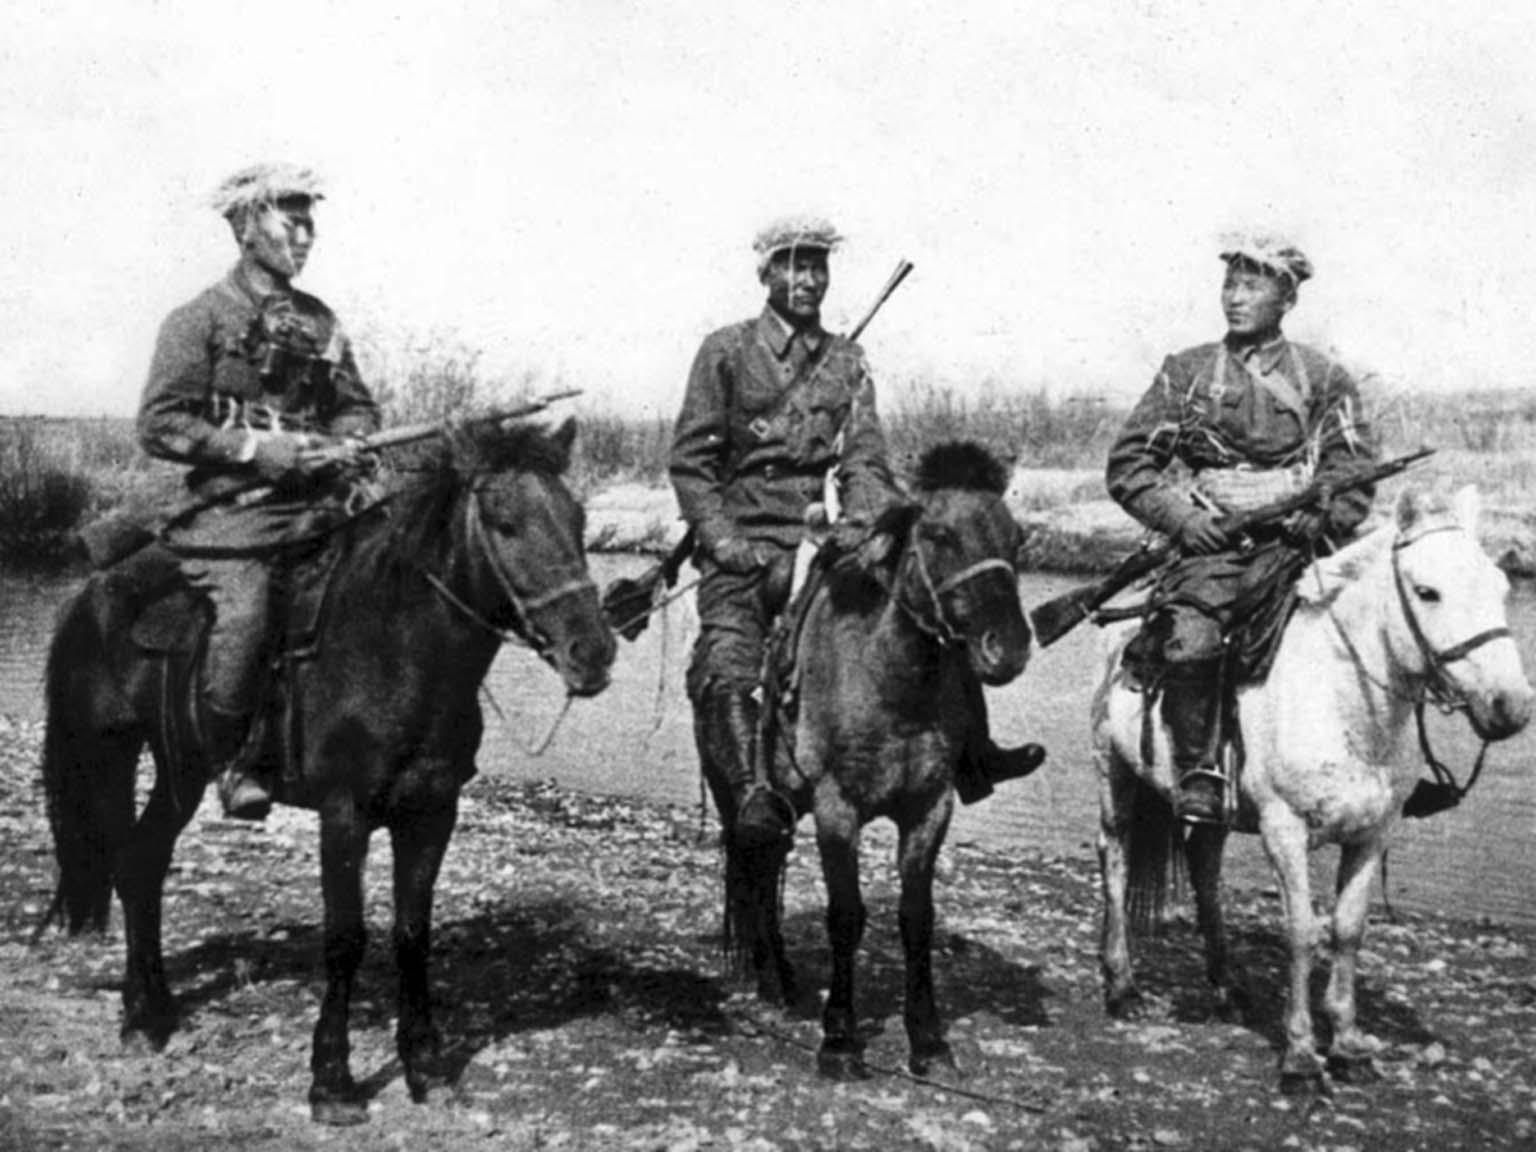 Mongolian cavalrymen